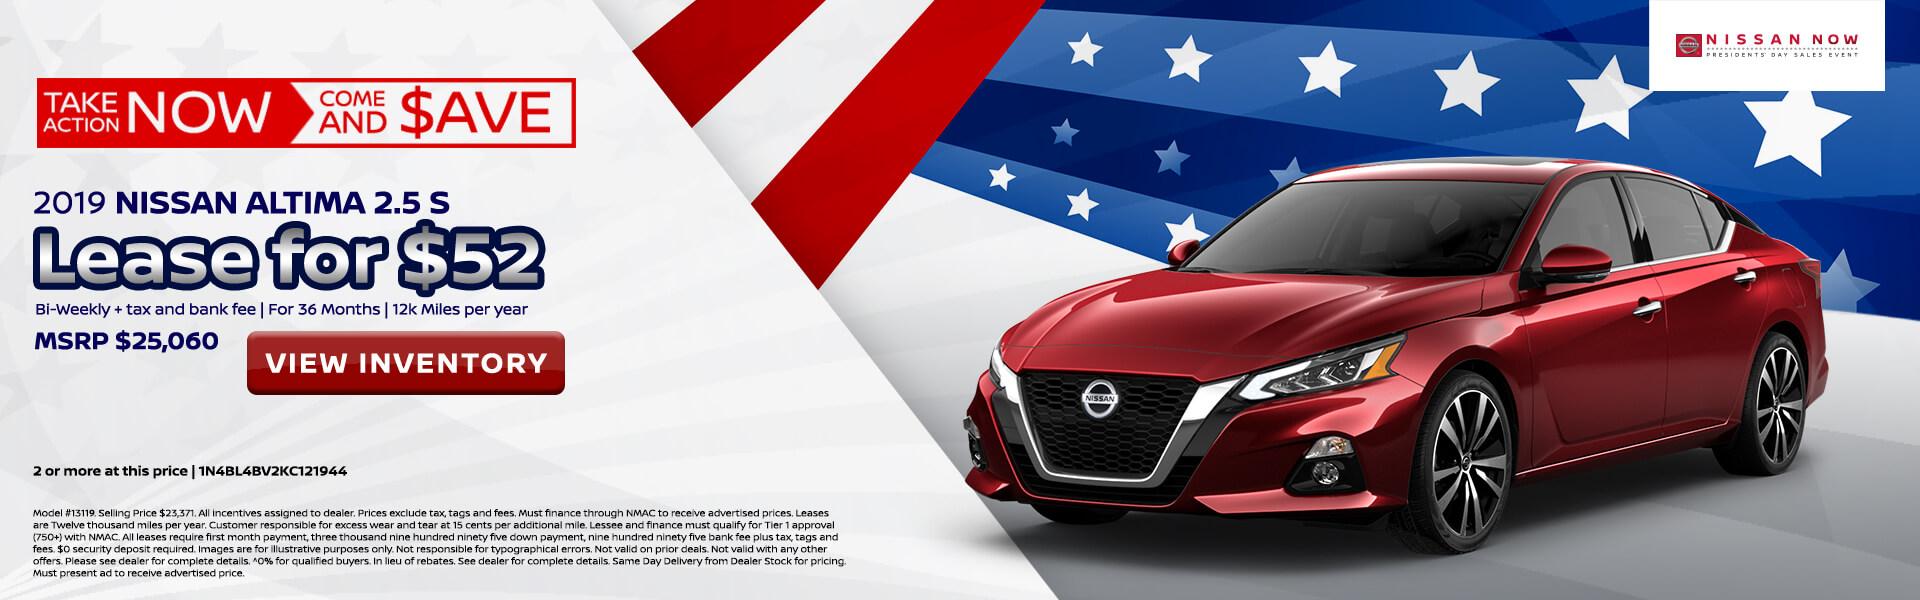 Nissan Altima $104 Lease